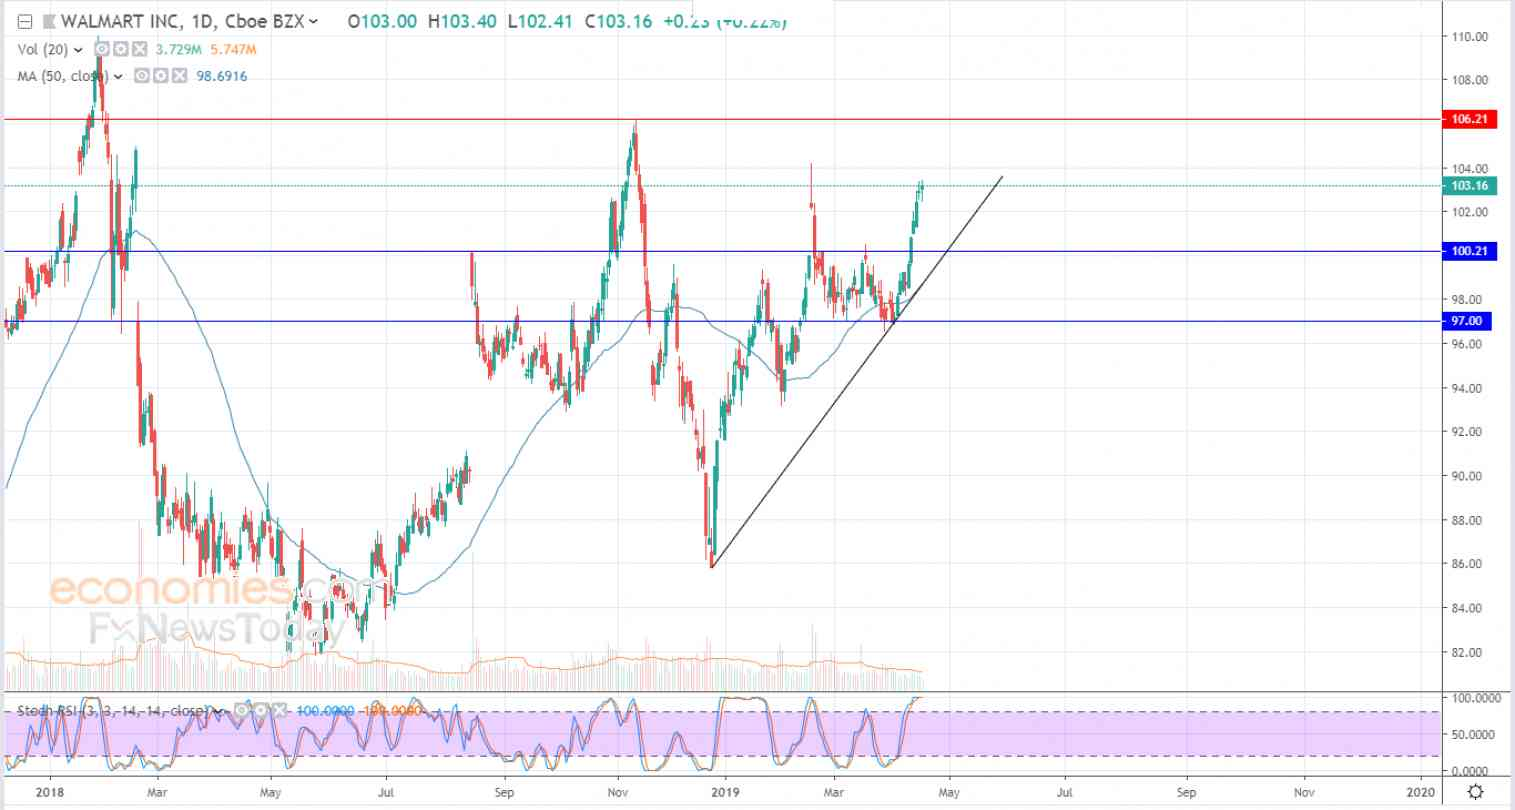 Walmart adds to gains - Analysis - 18-04-2019